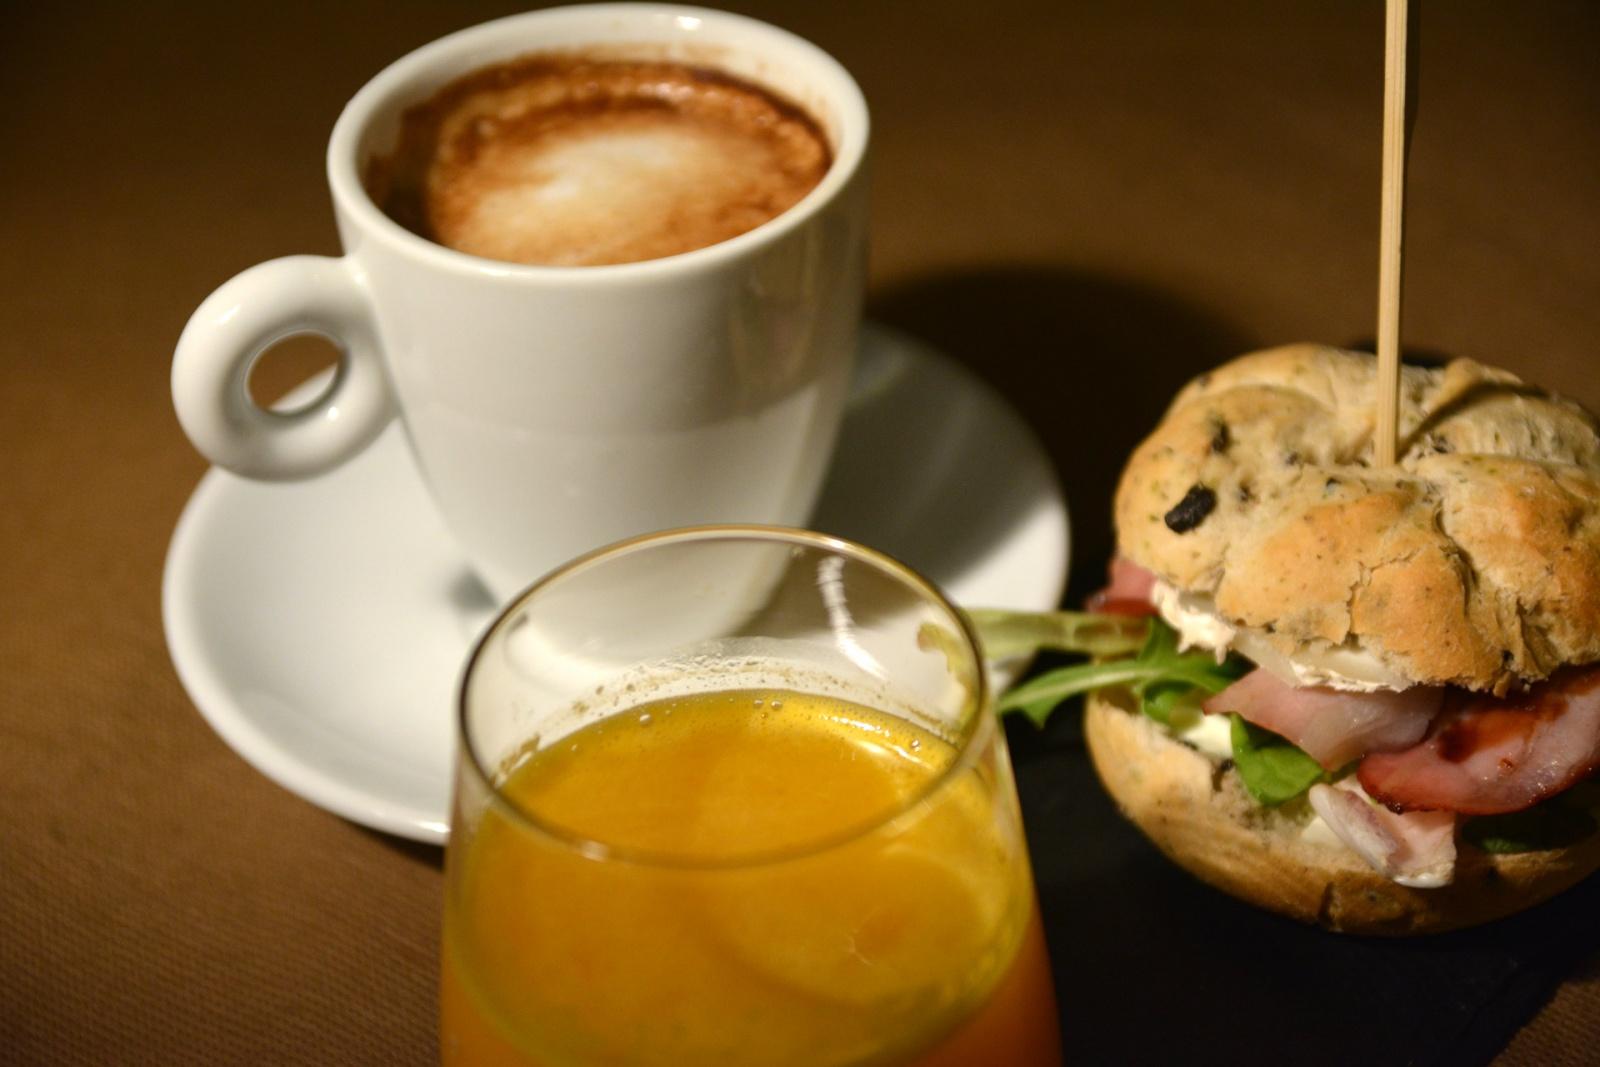 desayuno-salado-bocata_0.jpg